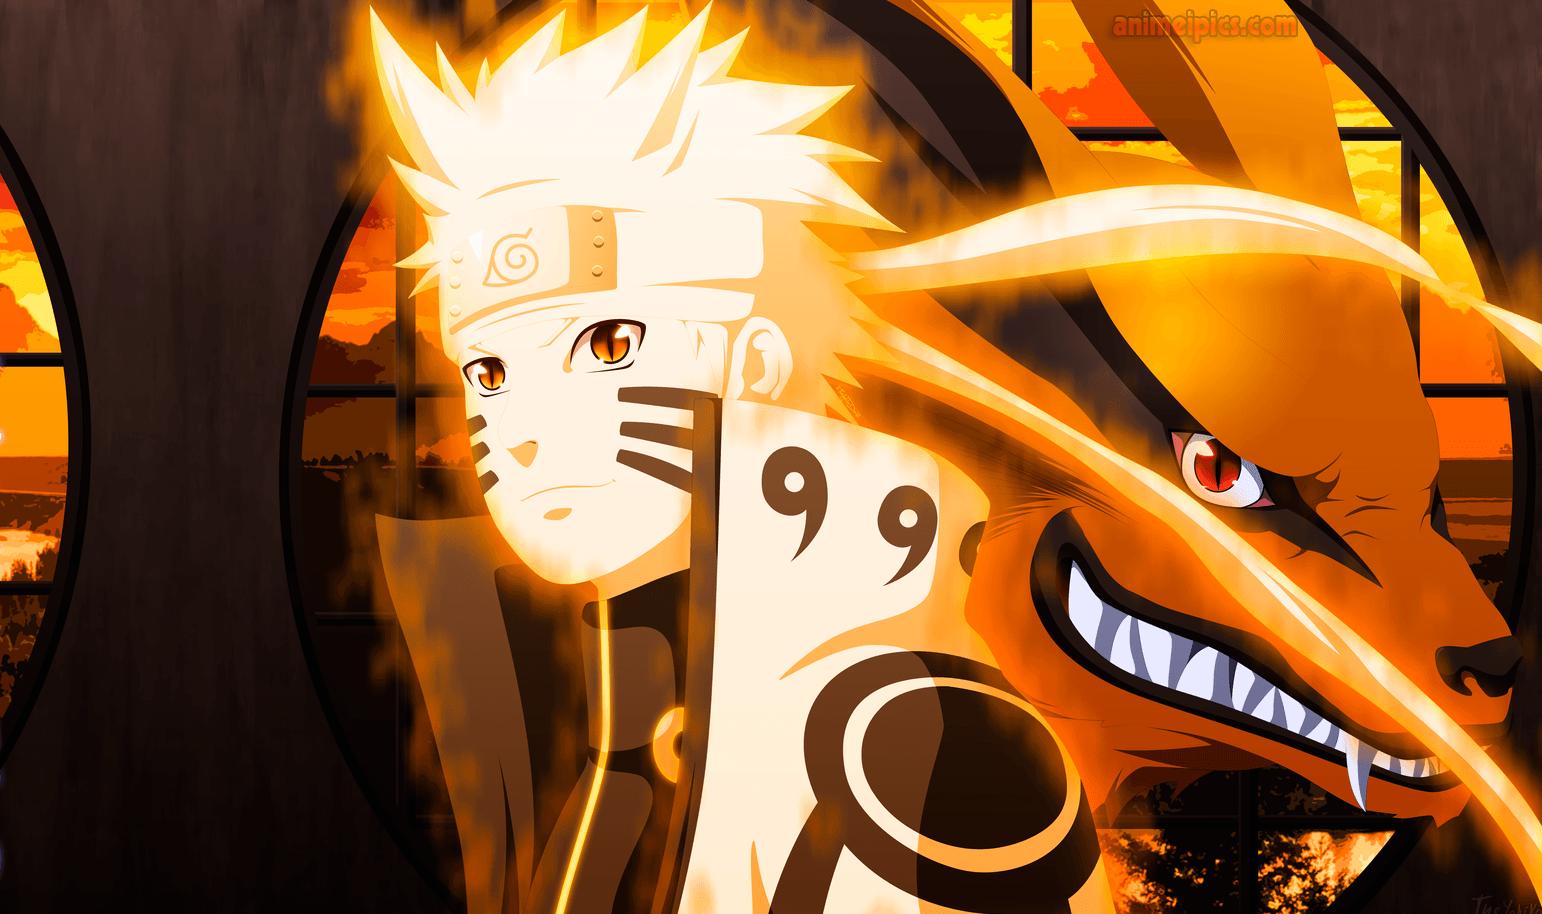 Naruto Shippuden Nineed Fox Mod Hd Wallpaper Background Images